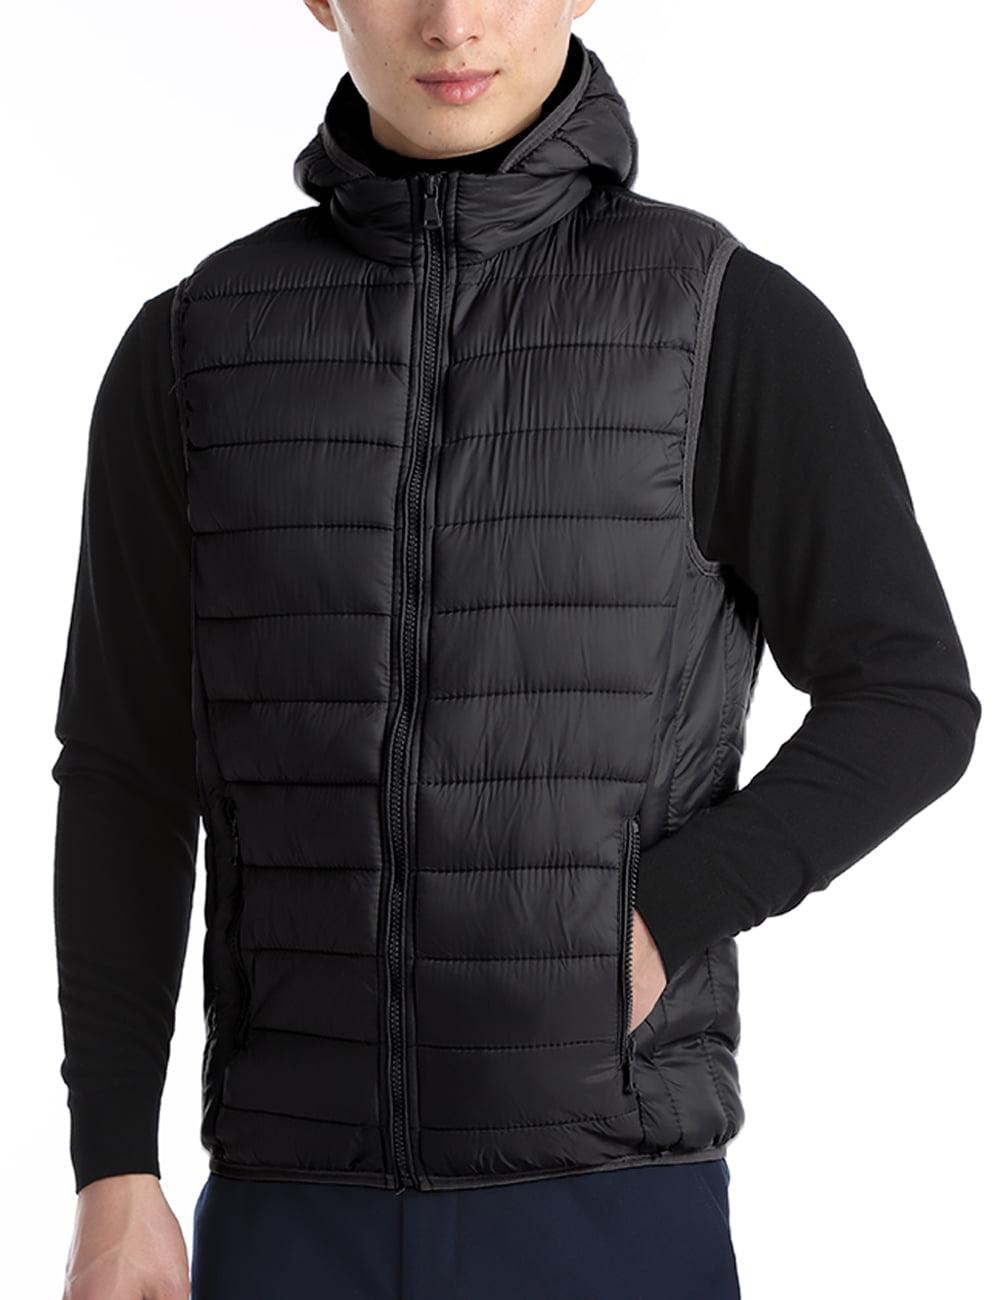 ONTBYB Mens Packable Stand Collar Puffer Down Lightweight Jacket Vest